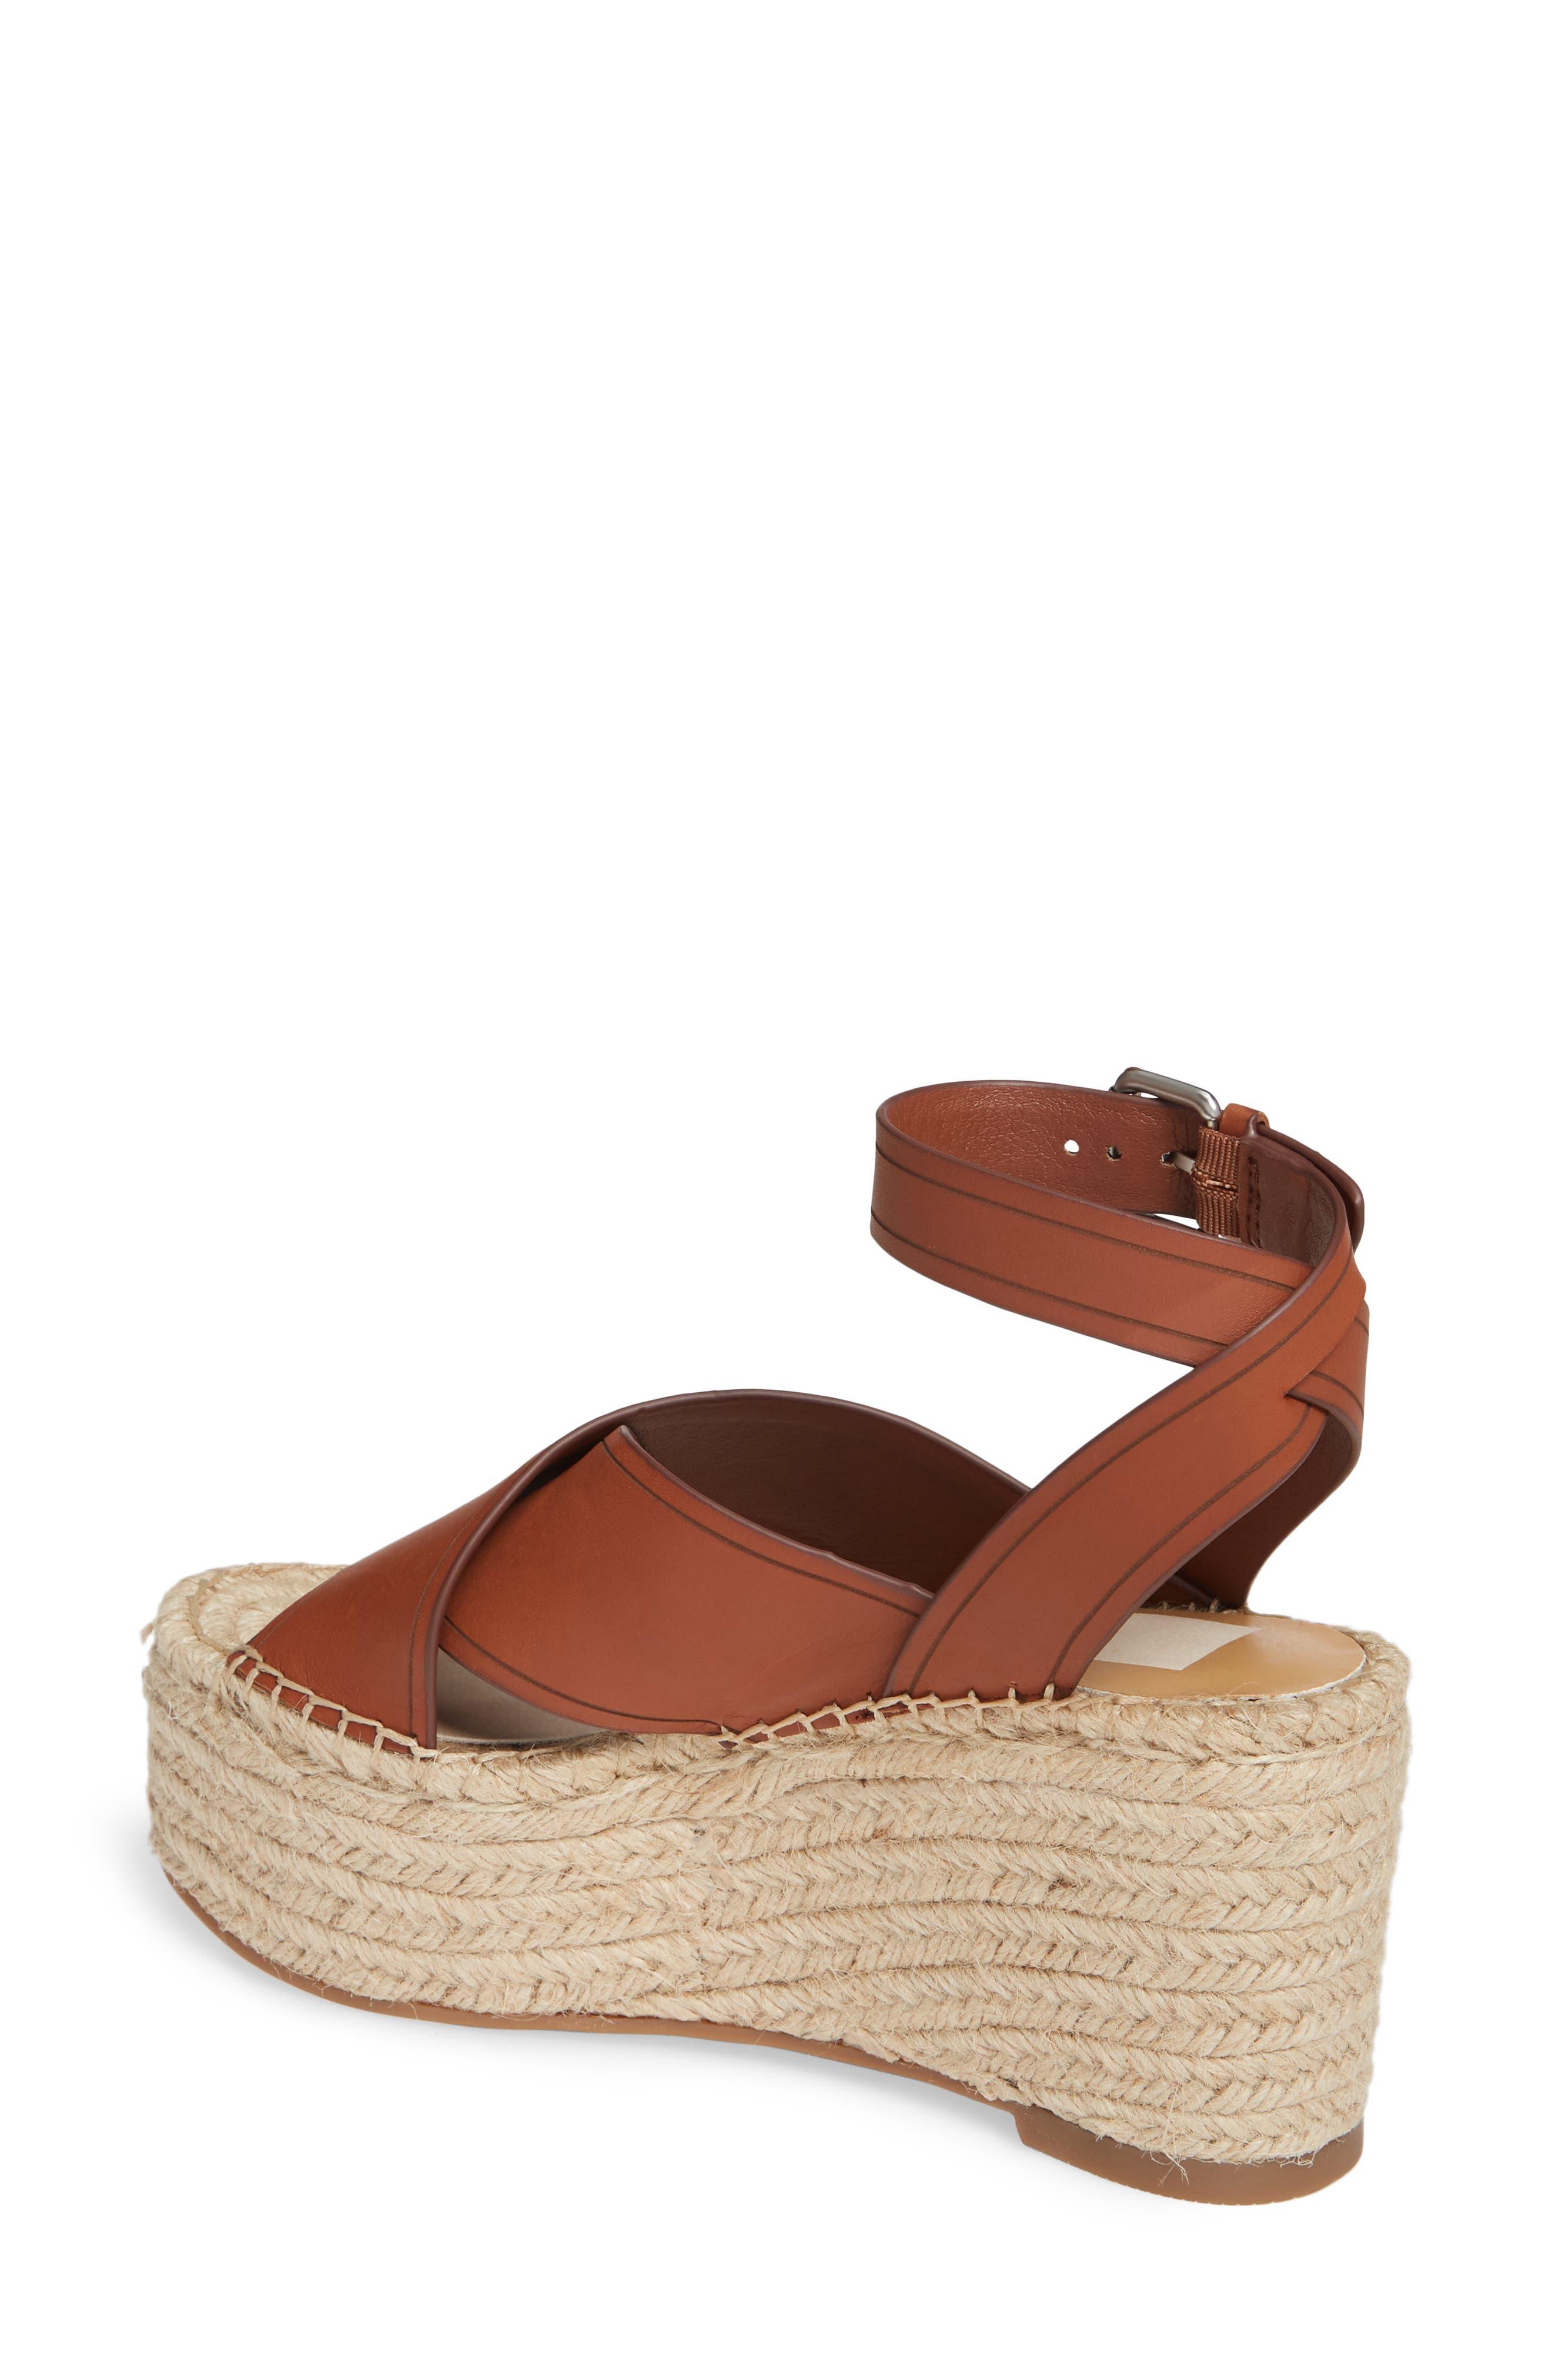 DOLCE VITA, Carsie Platform Sandal, Alternate thumbnail 2, color, BROWN LEATHER